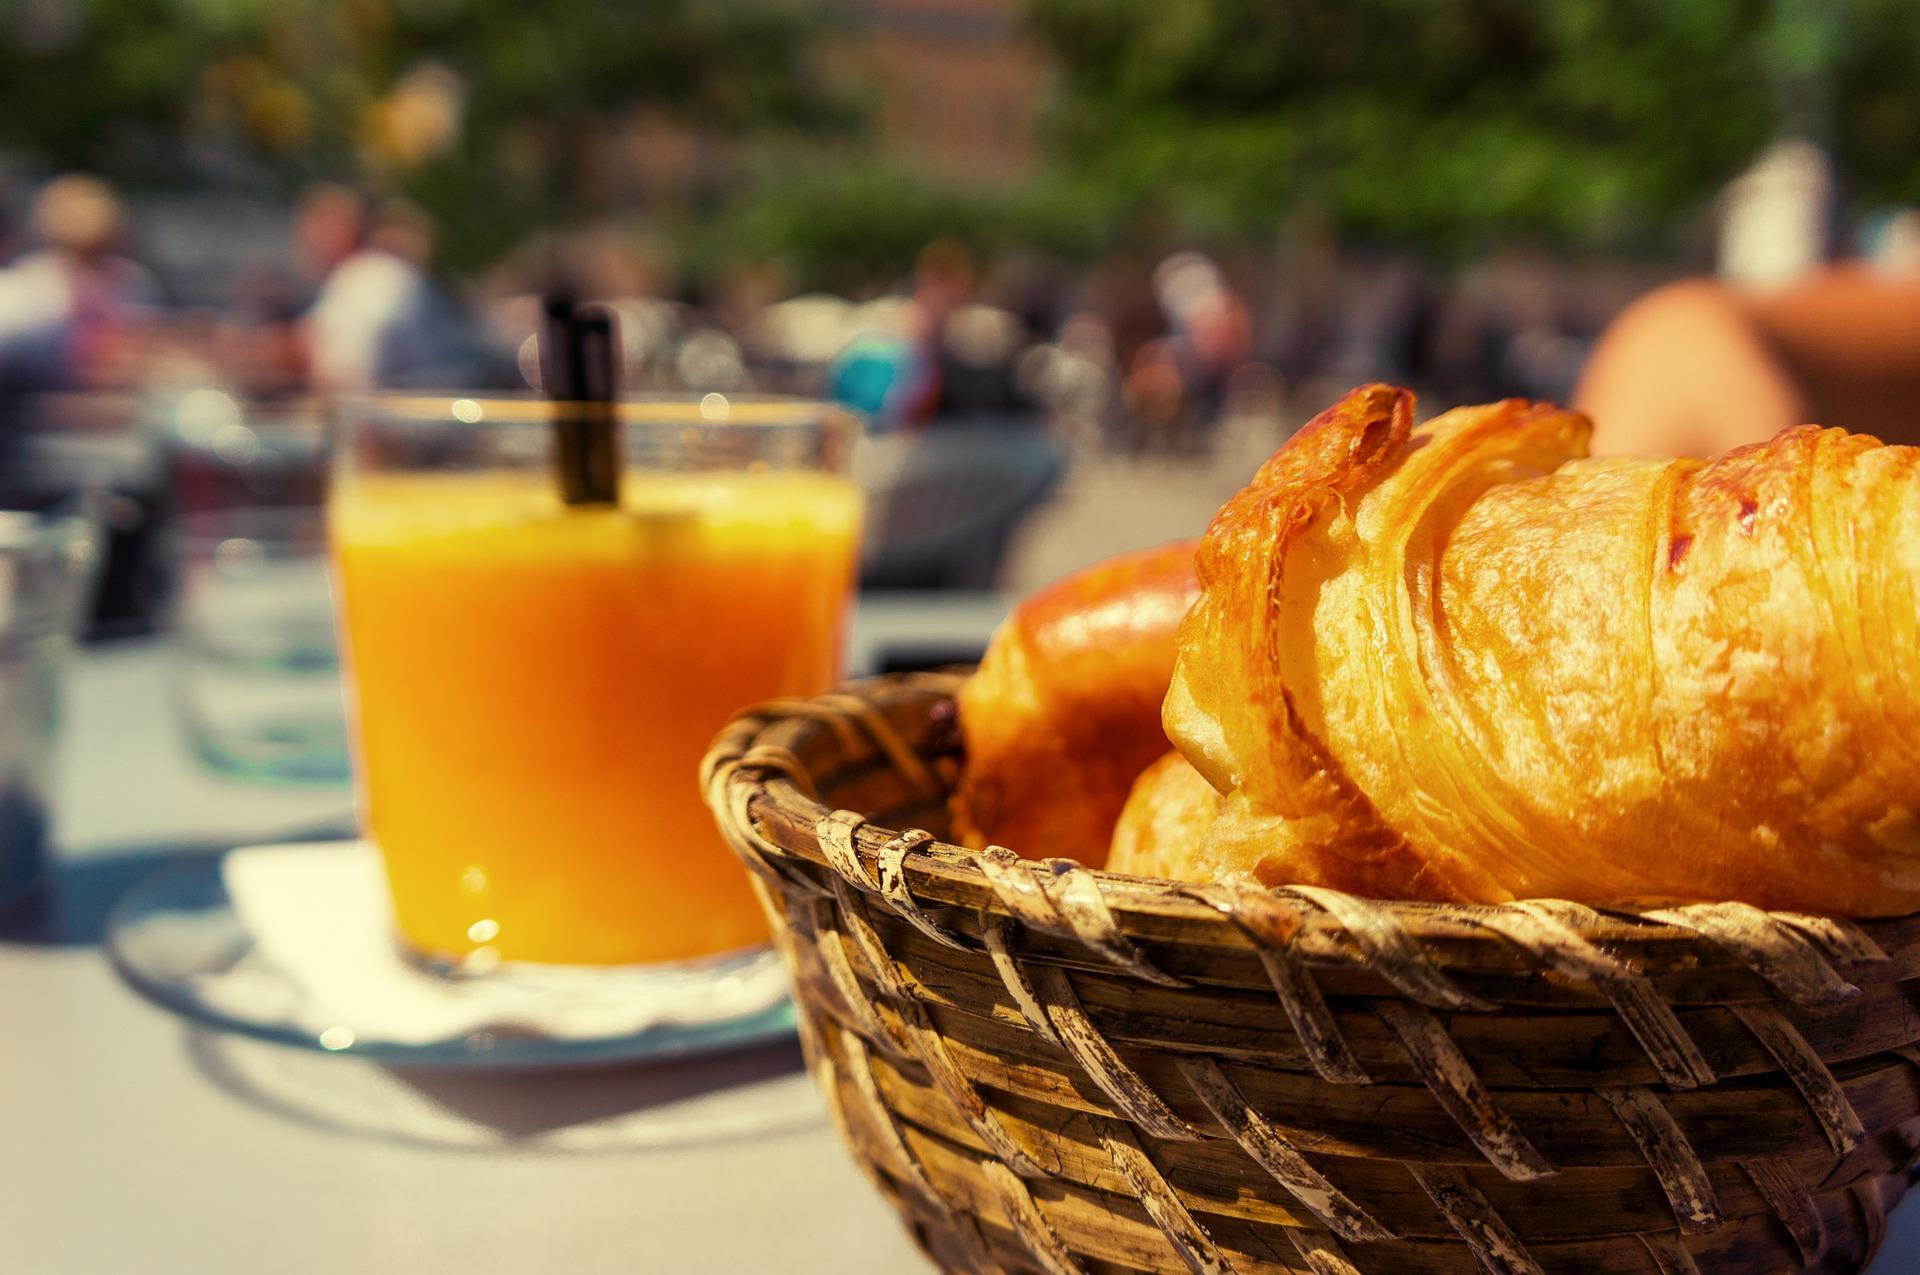 Frühstück im Freien, CC0 Public Domain, Up-Free/Pixabay